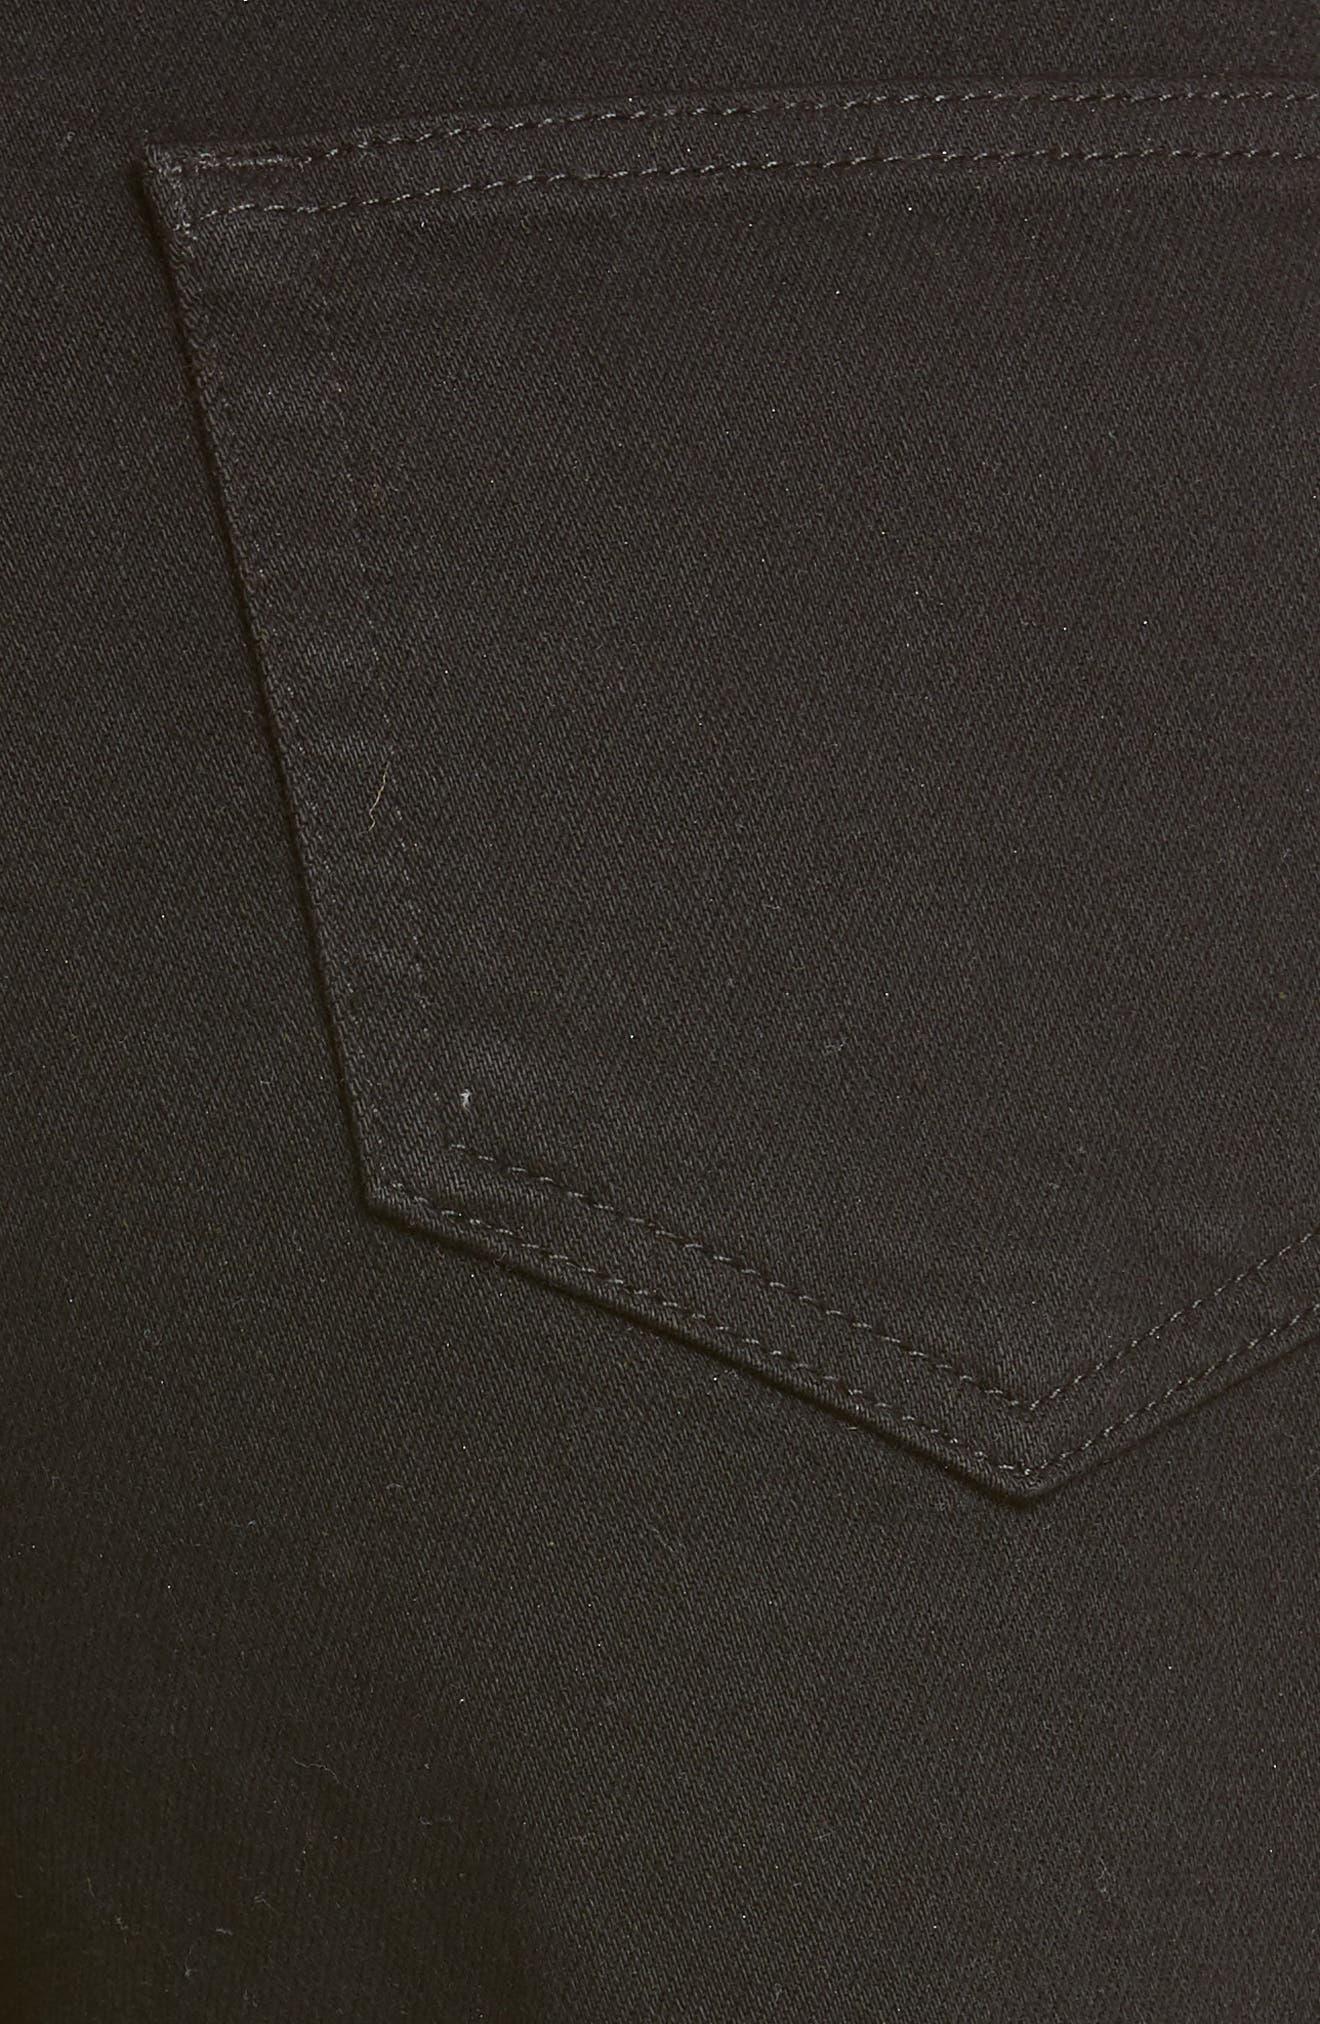 L'AGENCE, Ryland High Waist Denim Shorts, Alternate thumbnail 6, color, NOIR